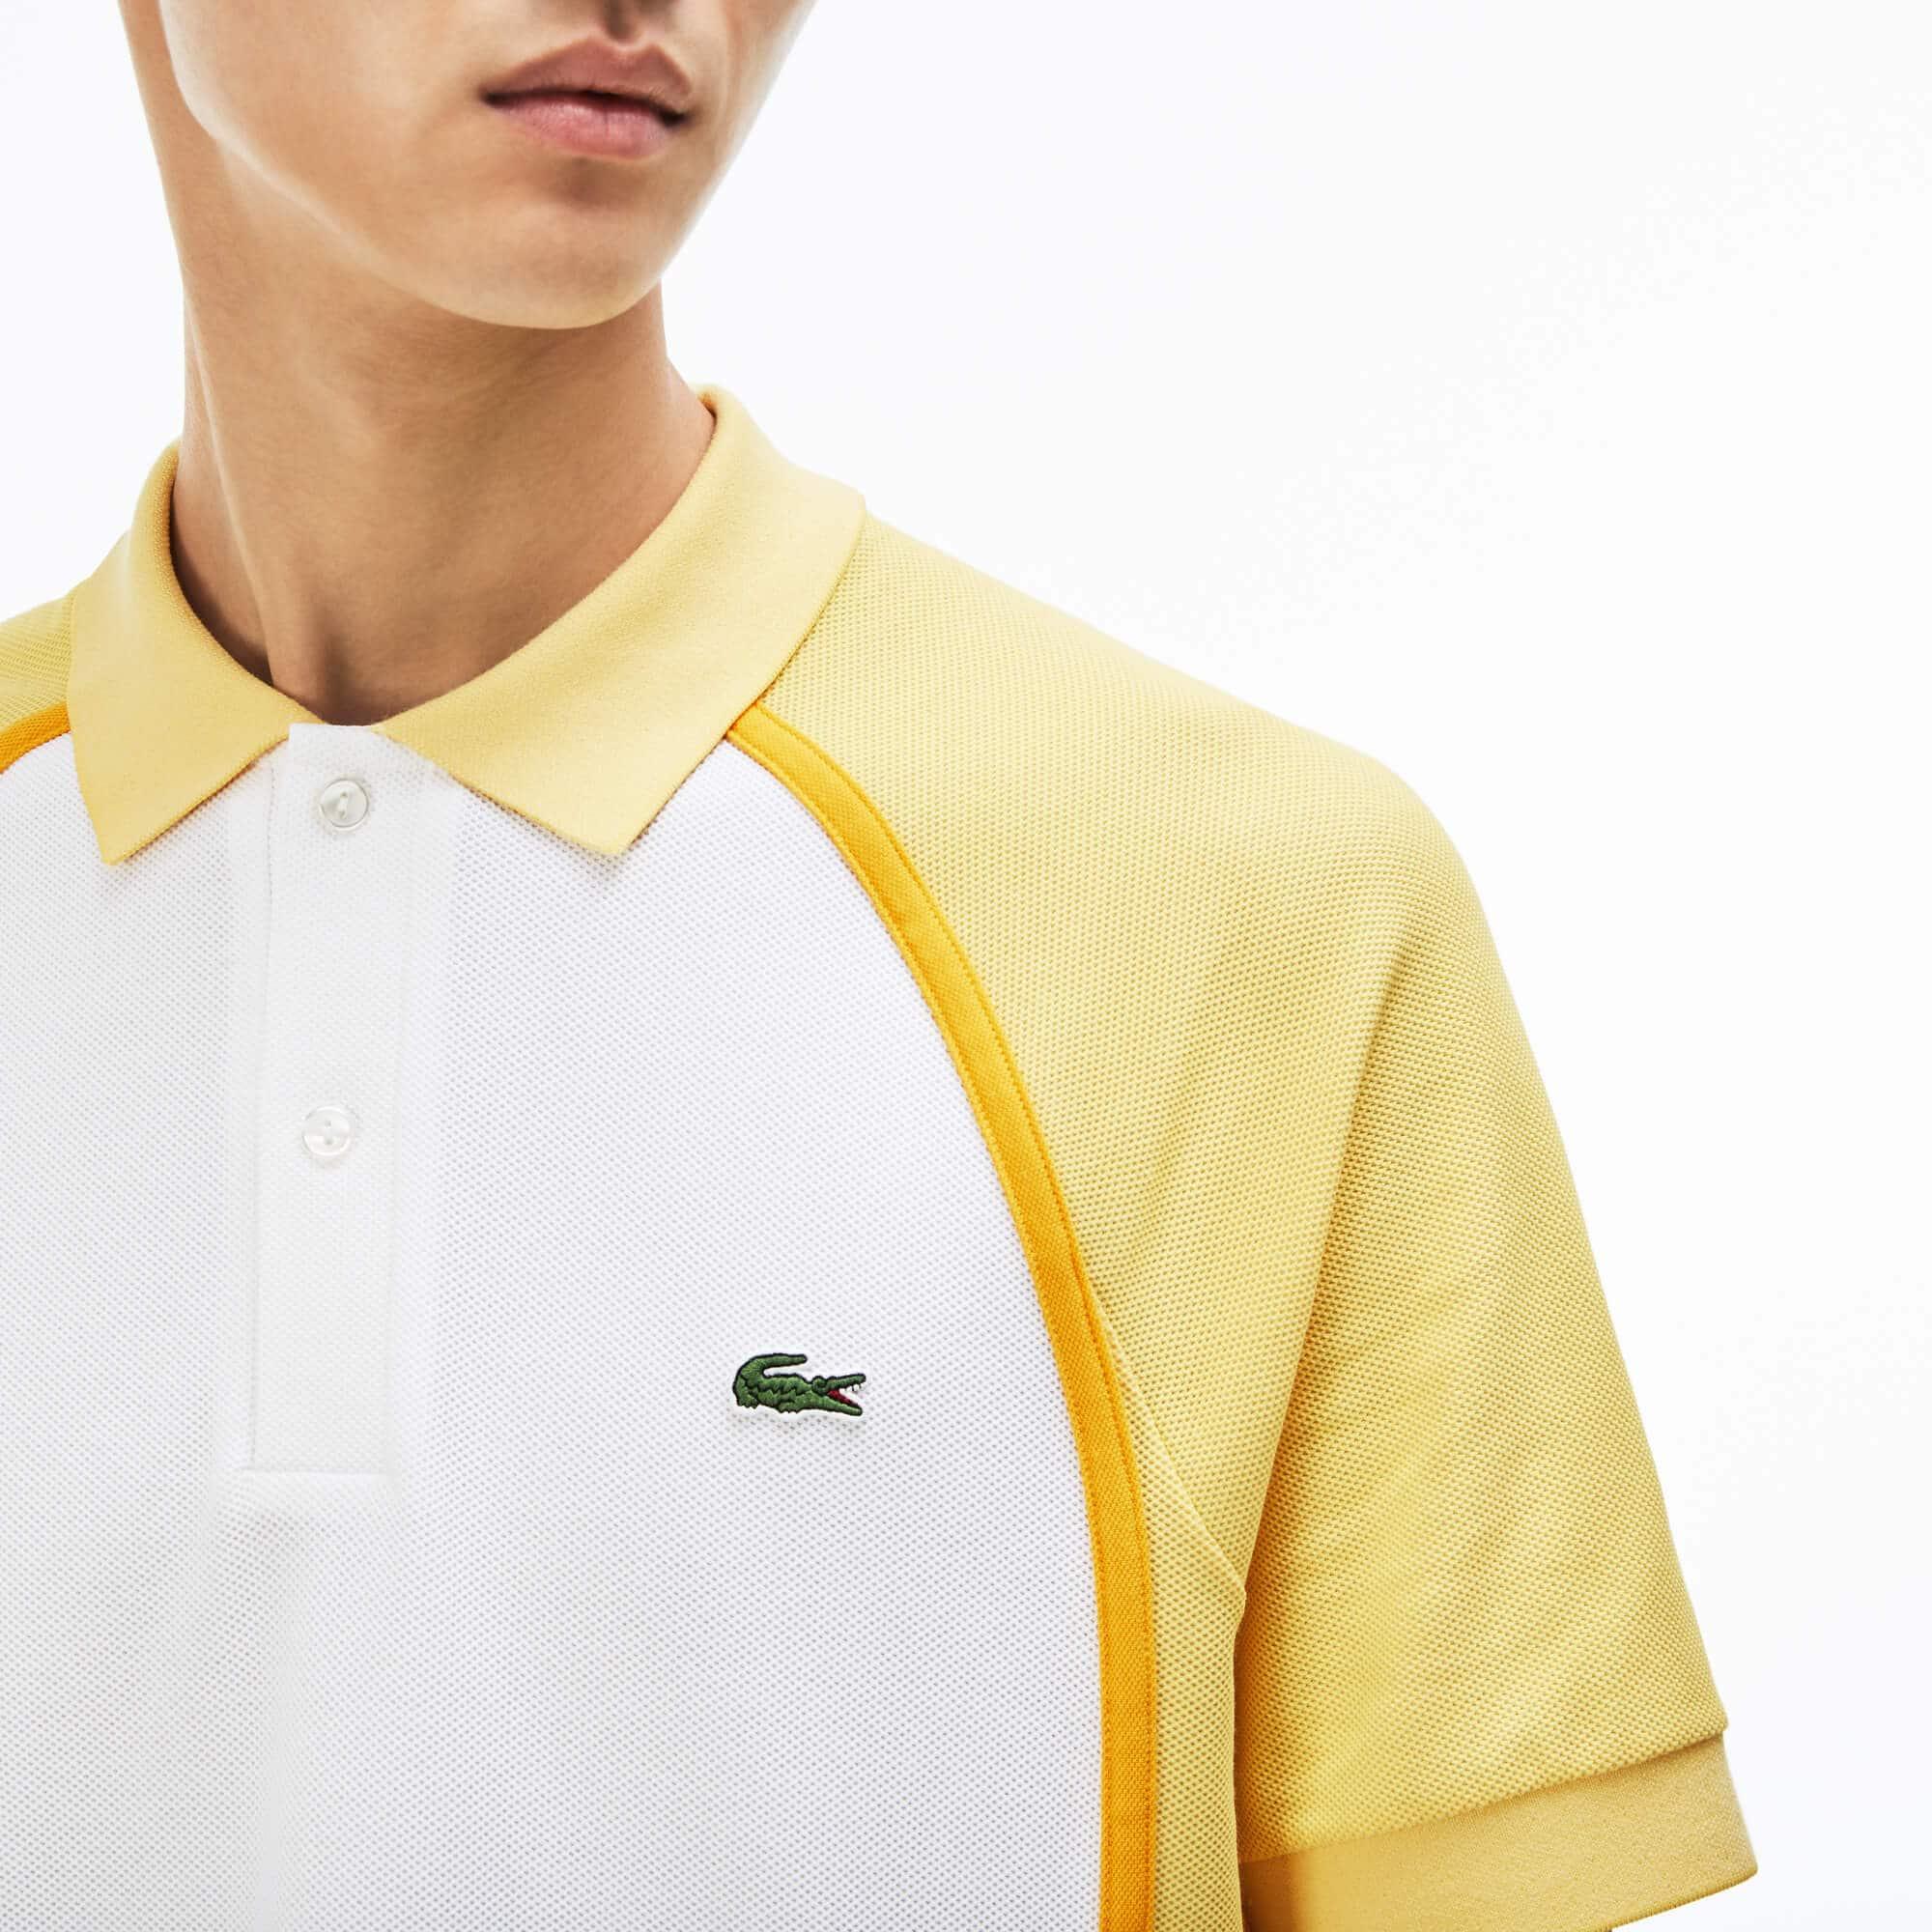 Polo regular fit Lacoste Made in France en piqué technique color block